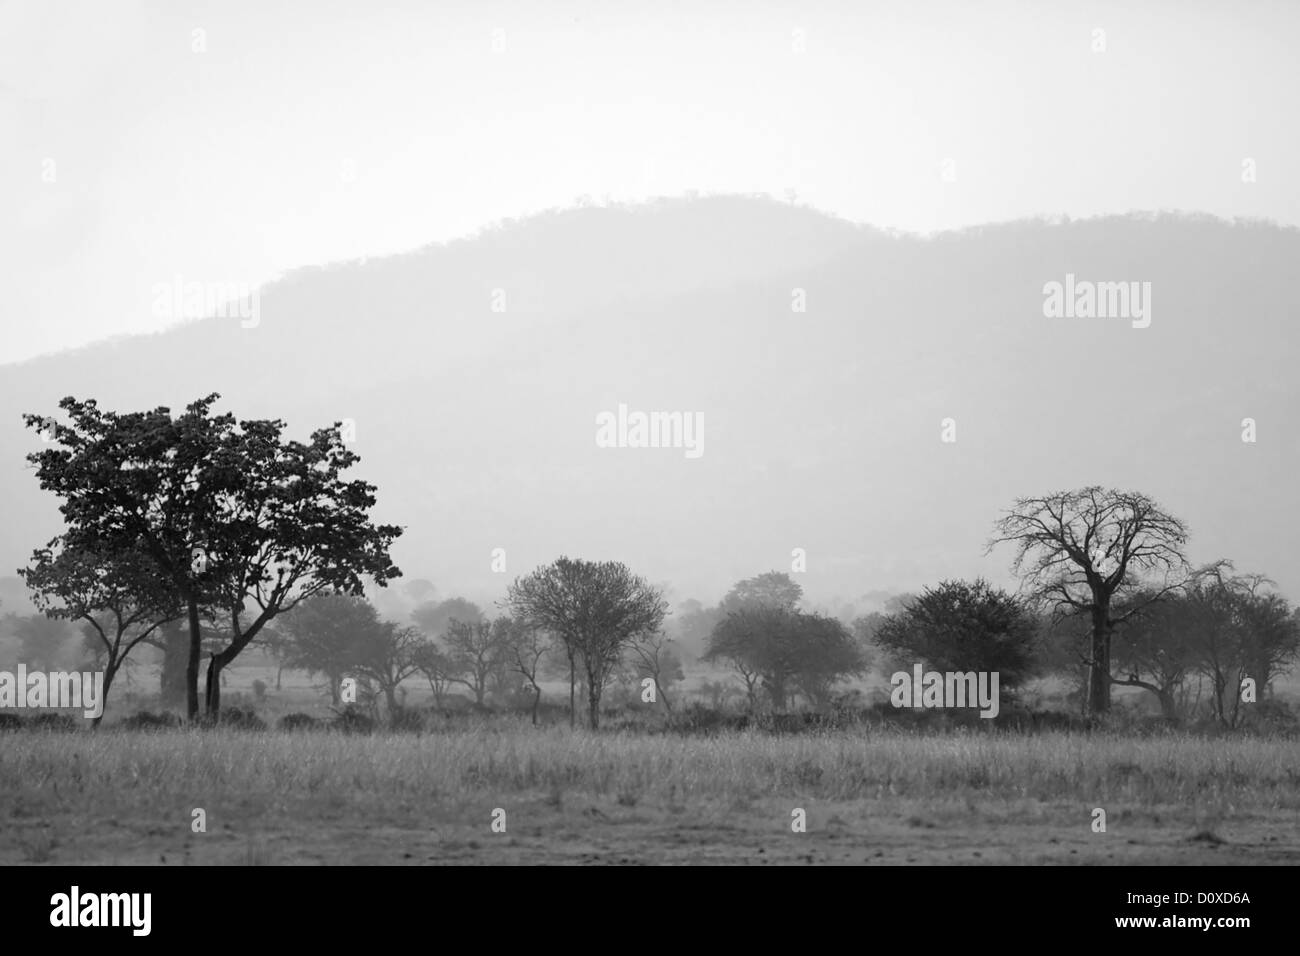 African Savannah - Stock Image